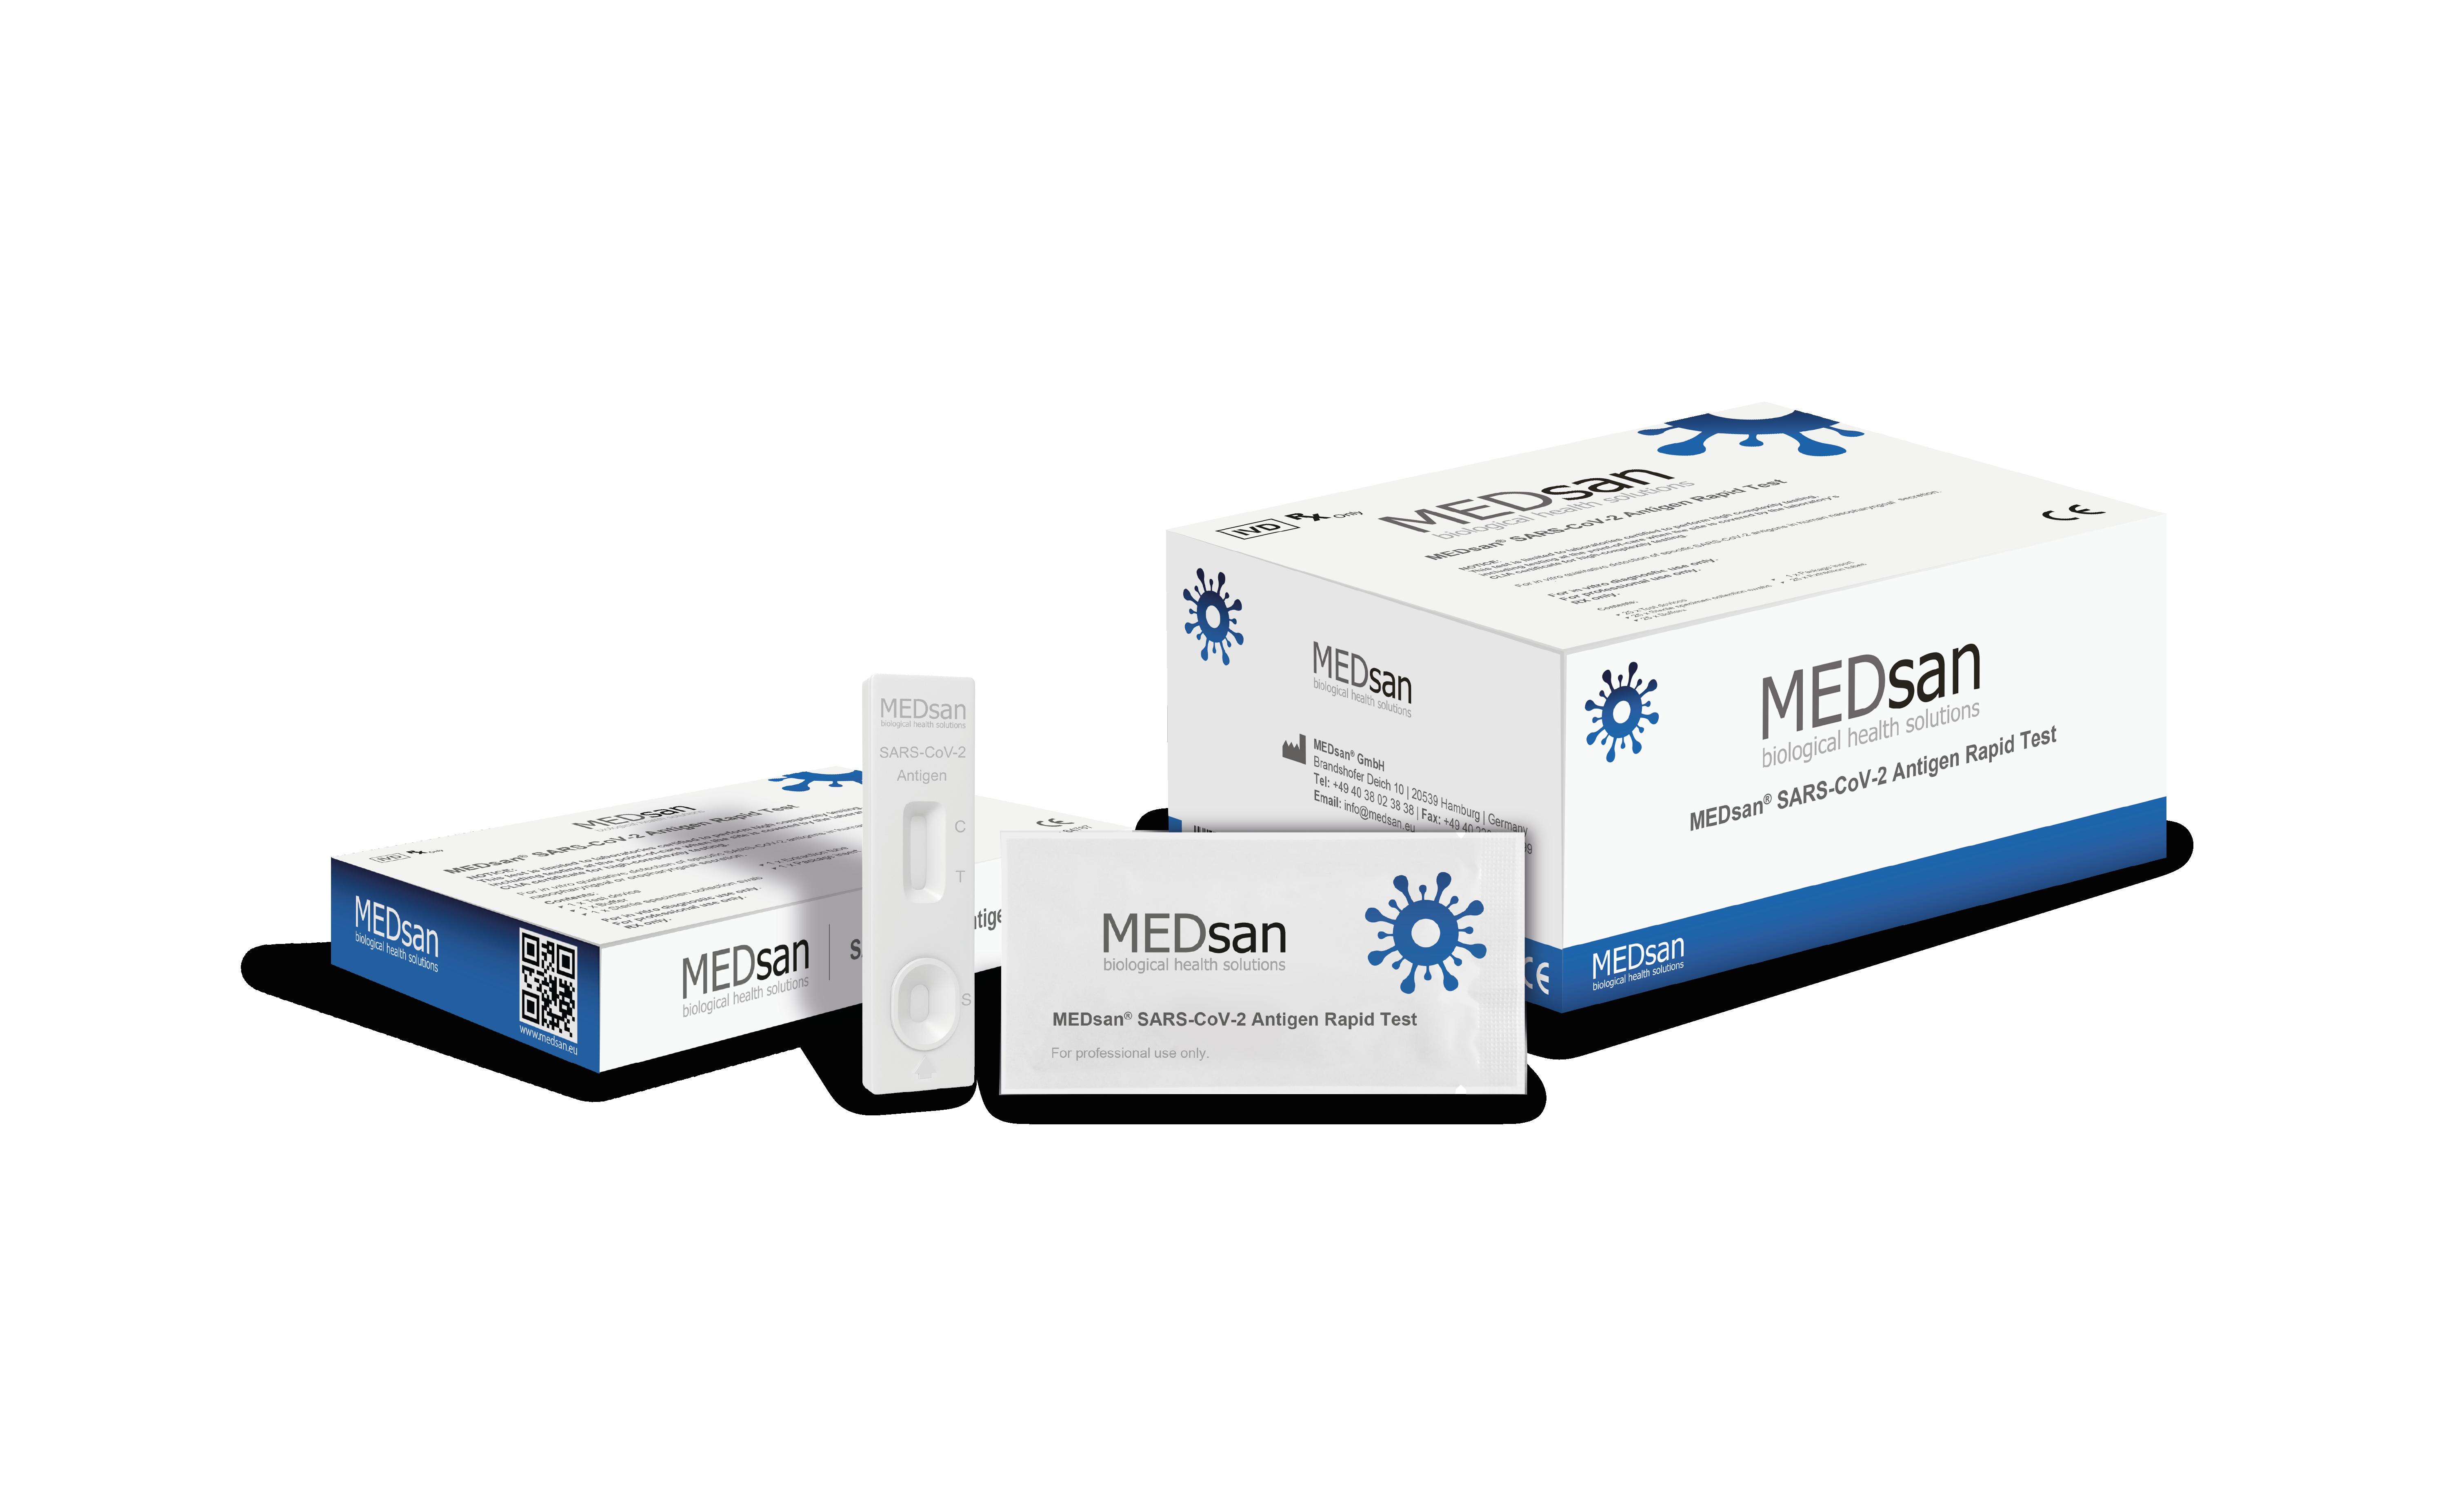 MEDsan® SARS-CoV-2 Antigen Rapid Test